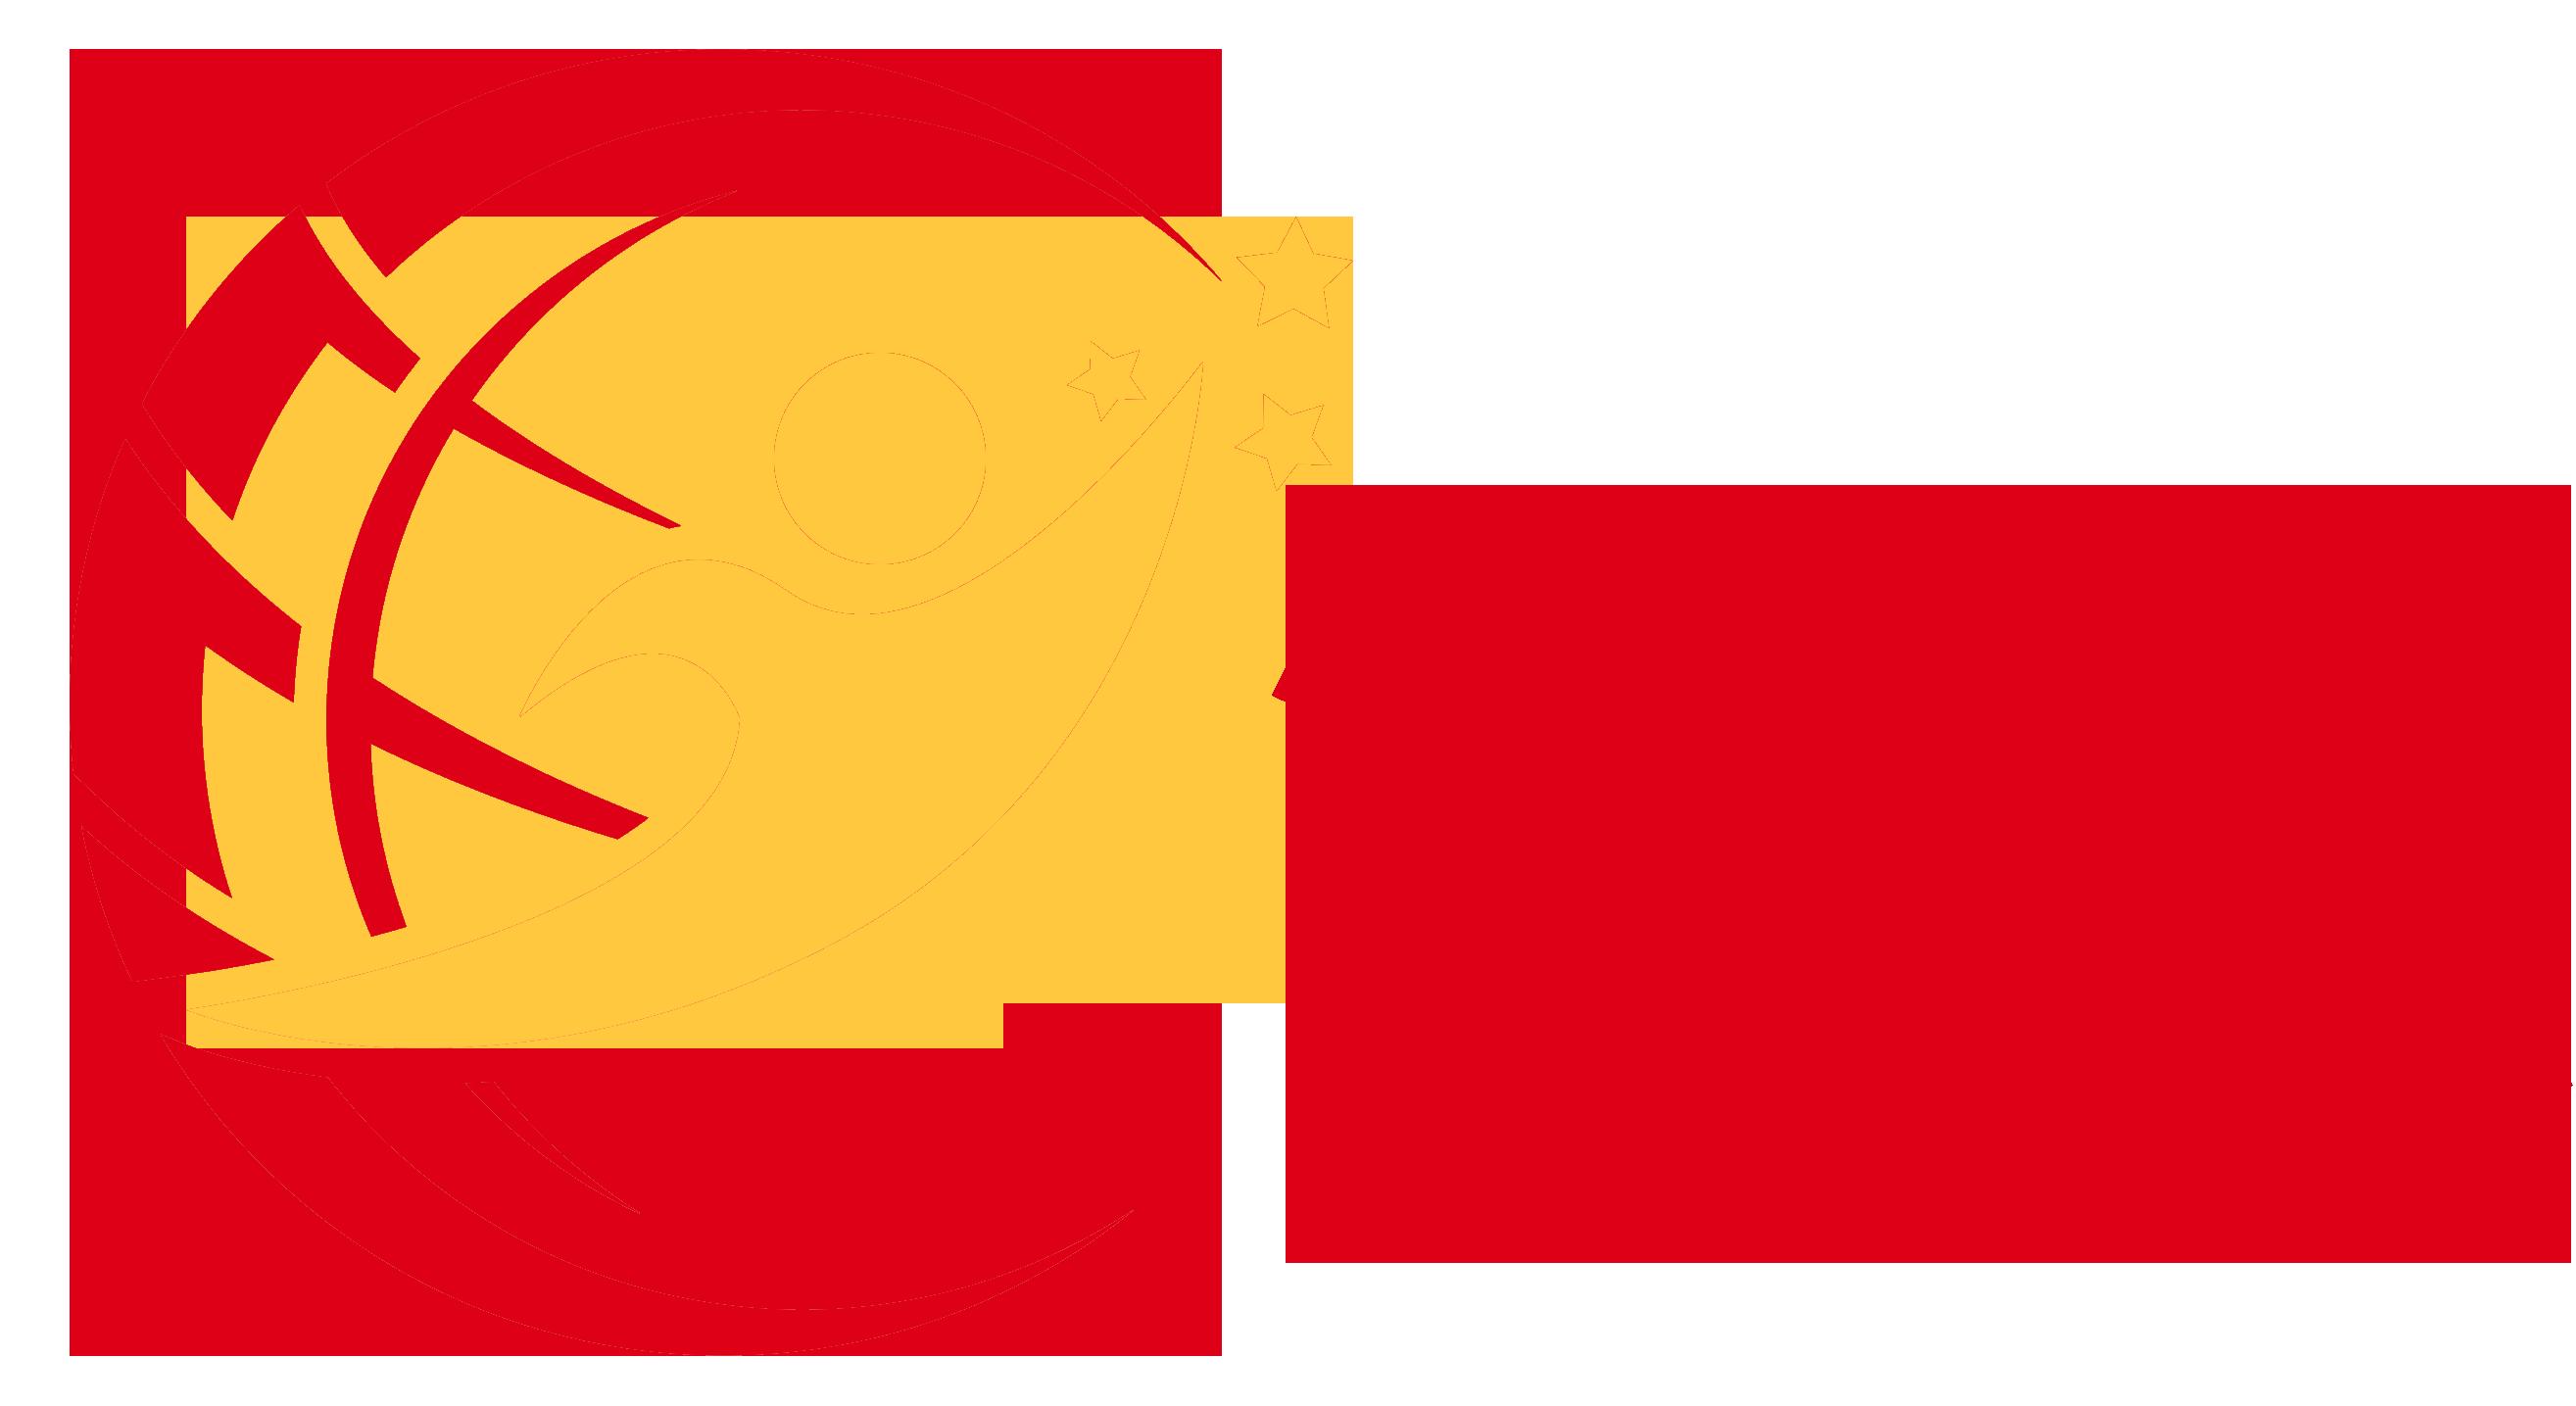 LOGO-CTITC